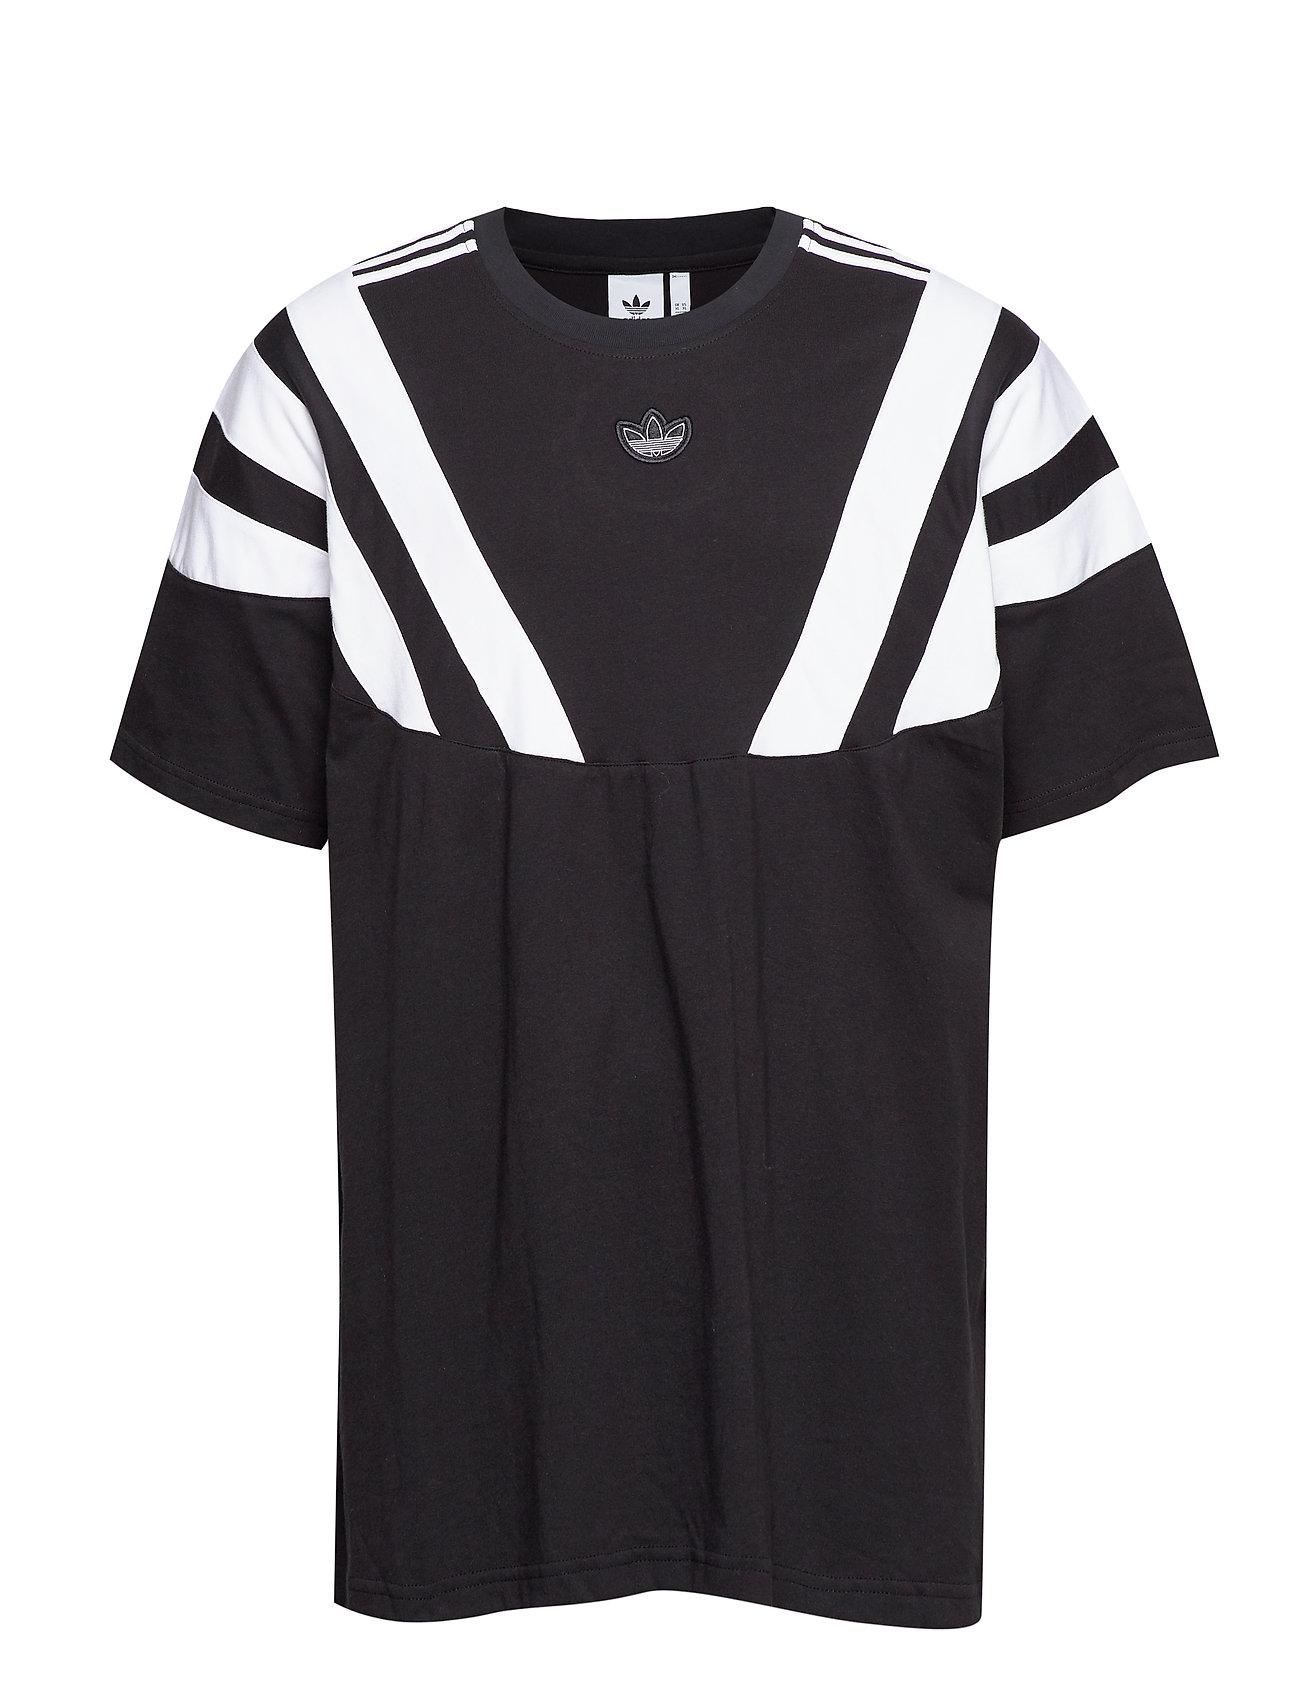 adidas Originals BLNT 96 JSY - BLACK